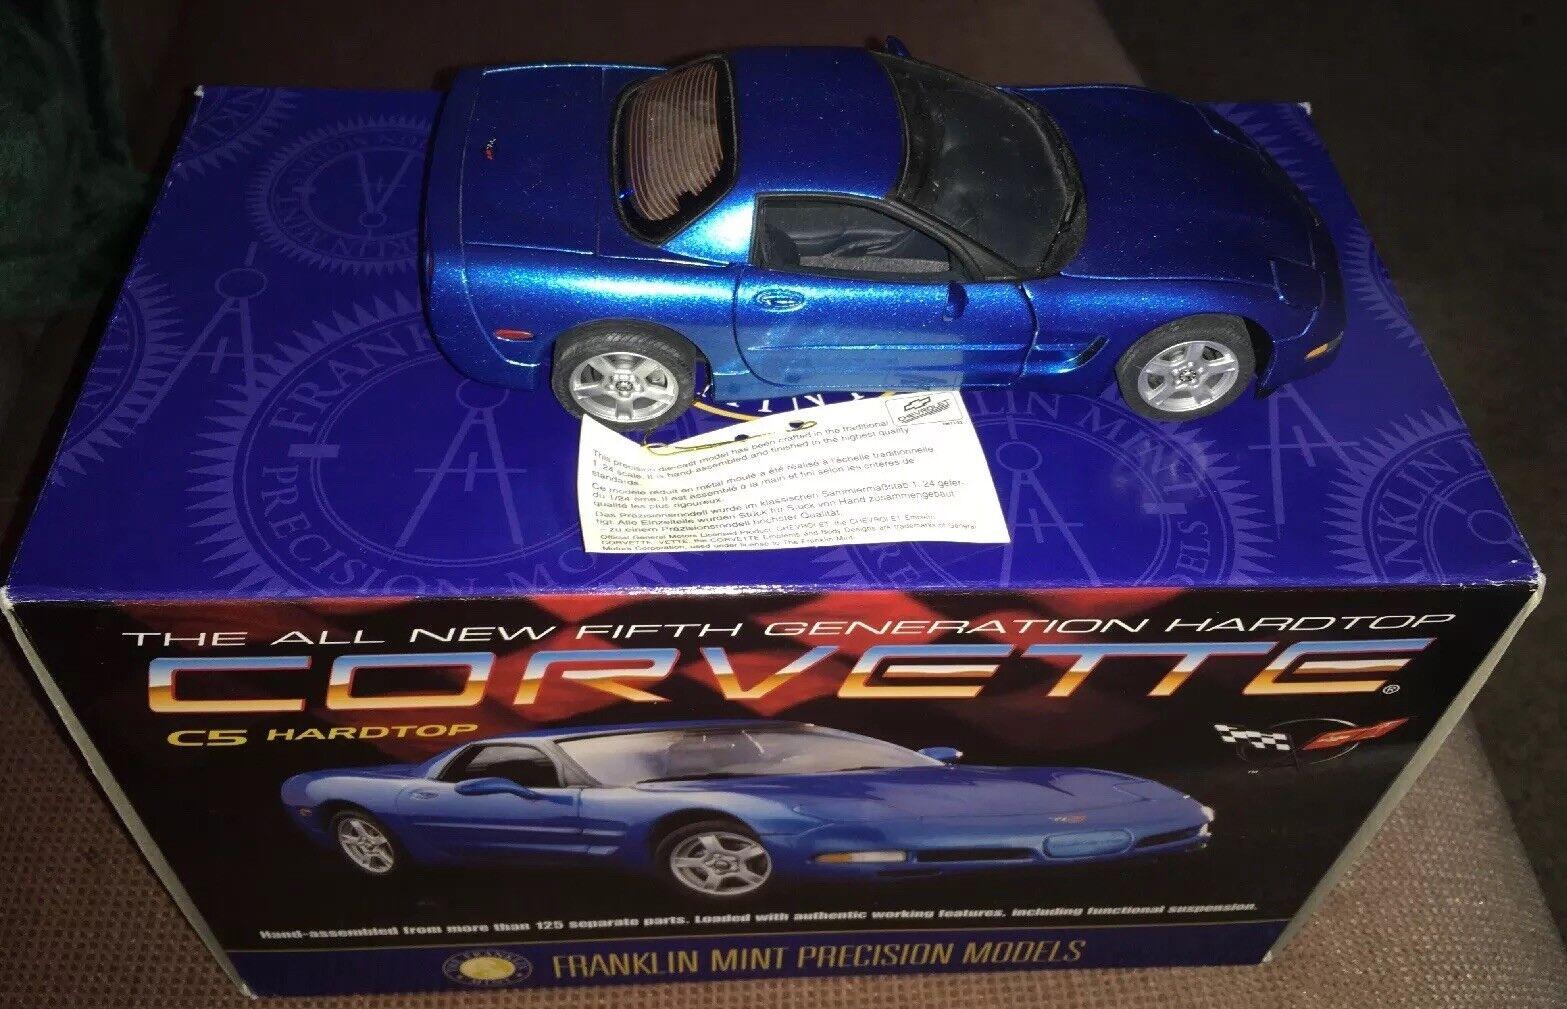 Franklin Mint 1999 Chevrolet Corvette Hardtop 1 24 Die Cast Metal Box & COA MIB